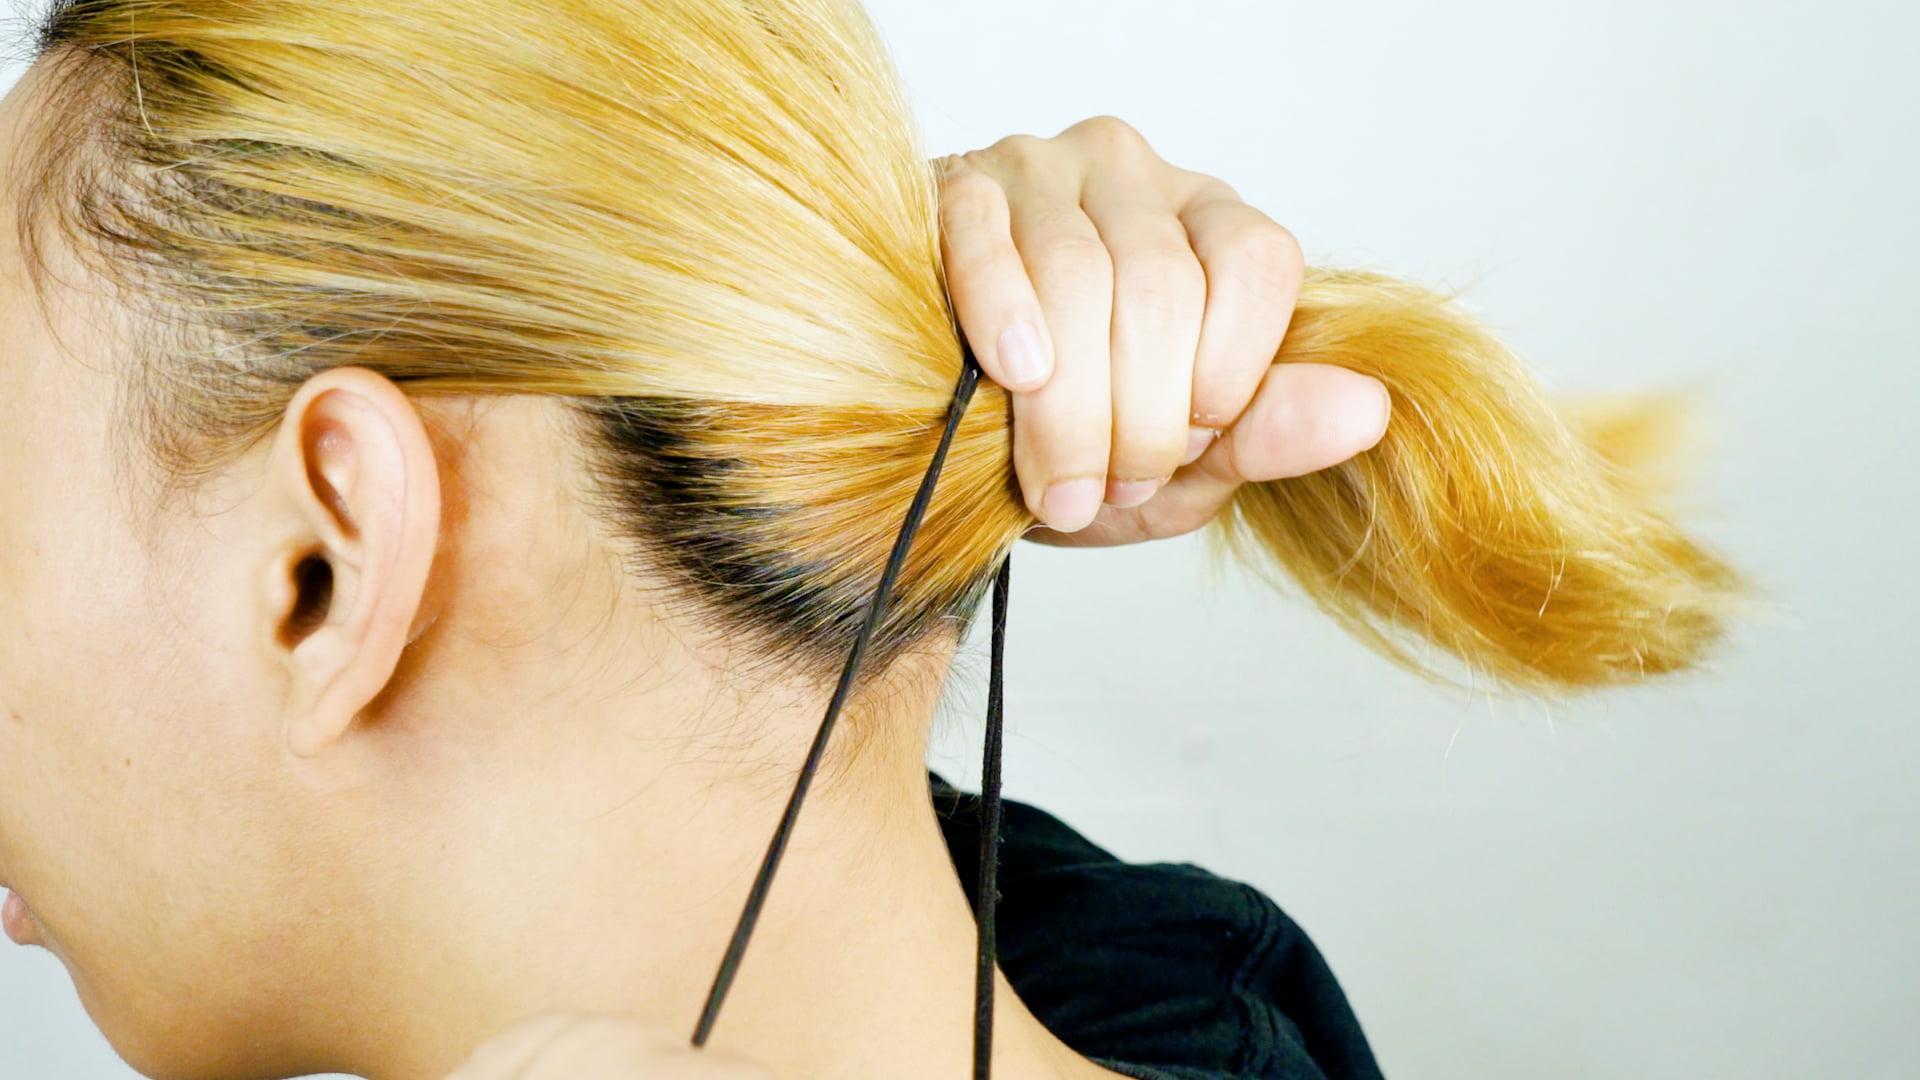 Keep Long Hair Tied Back